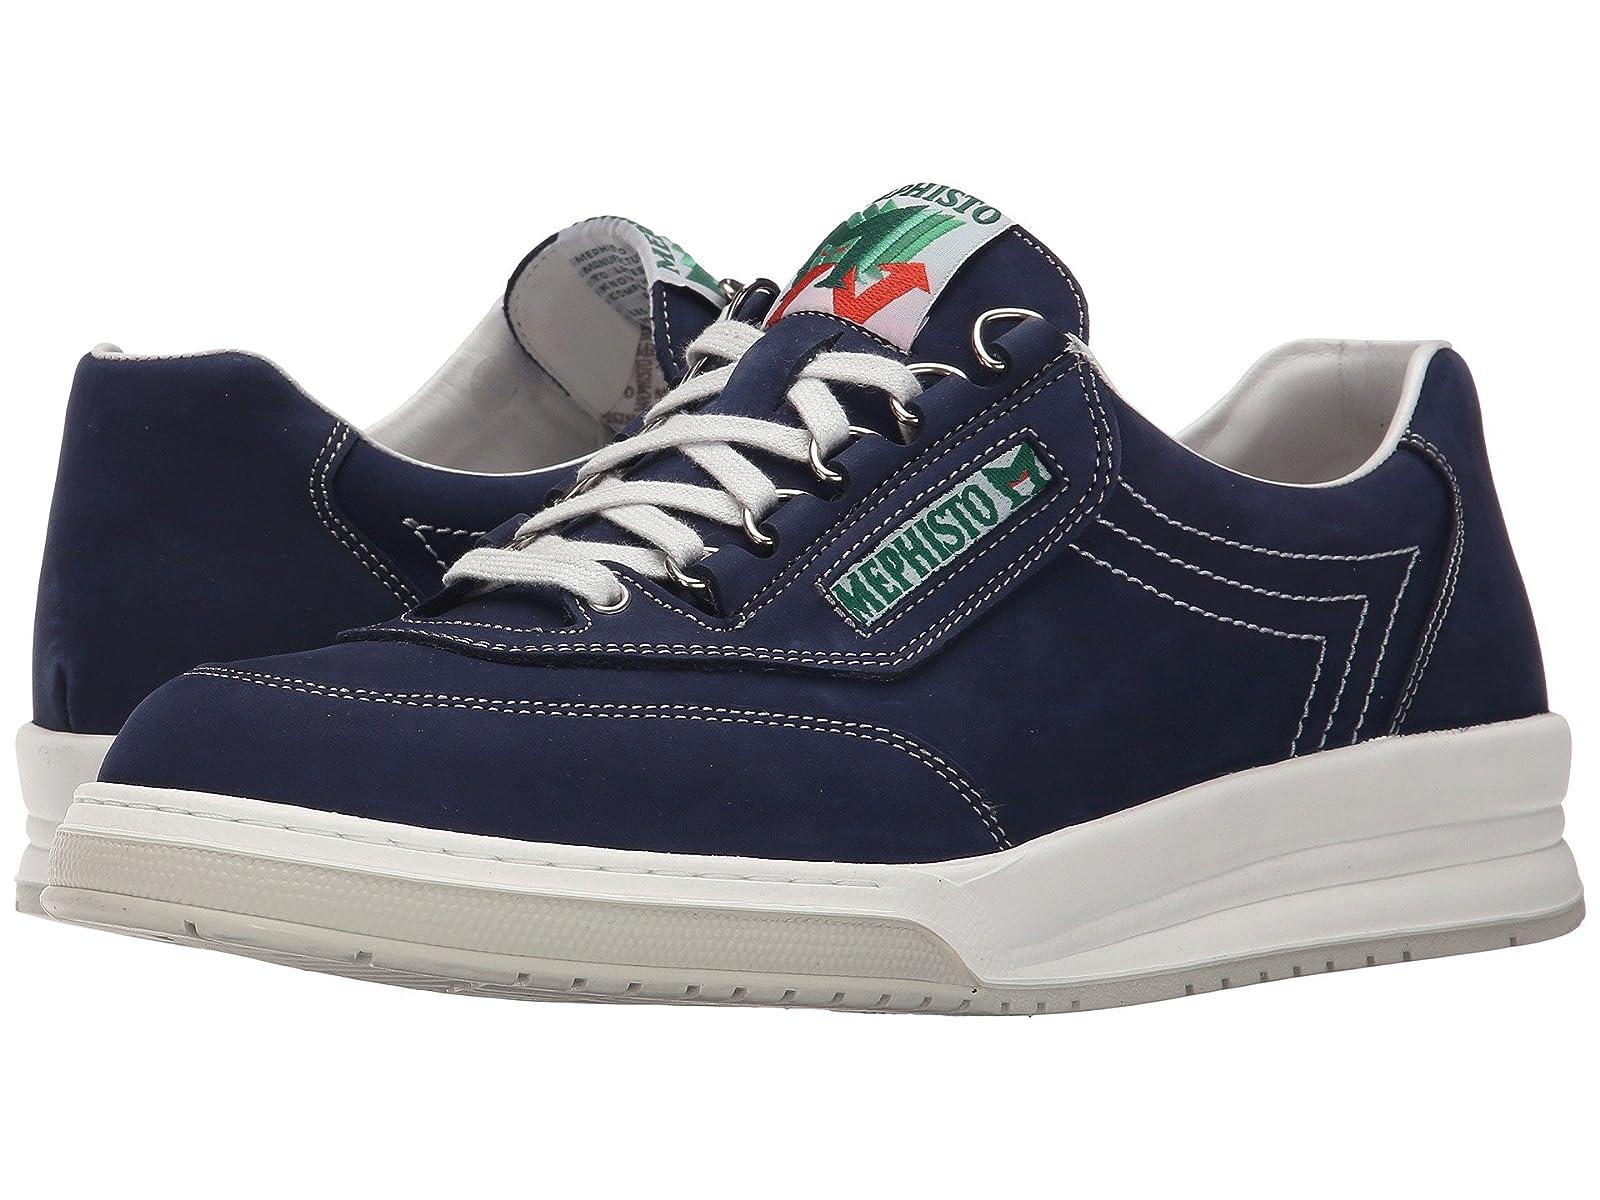 Mephisto MatchAtmospheric grades have affordable shoes